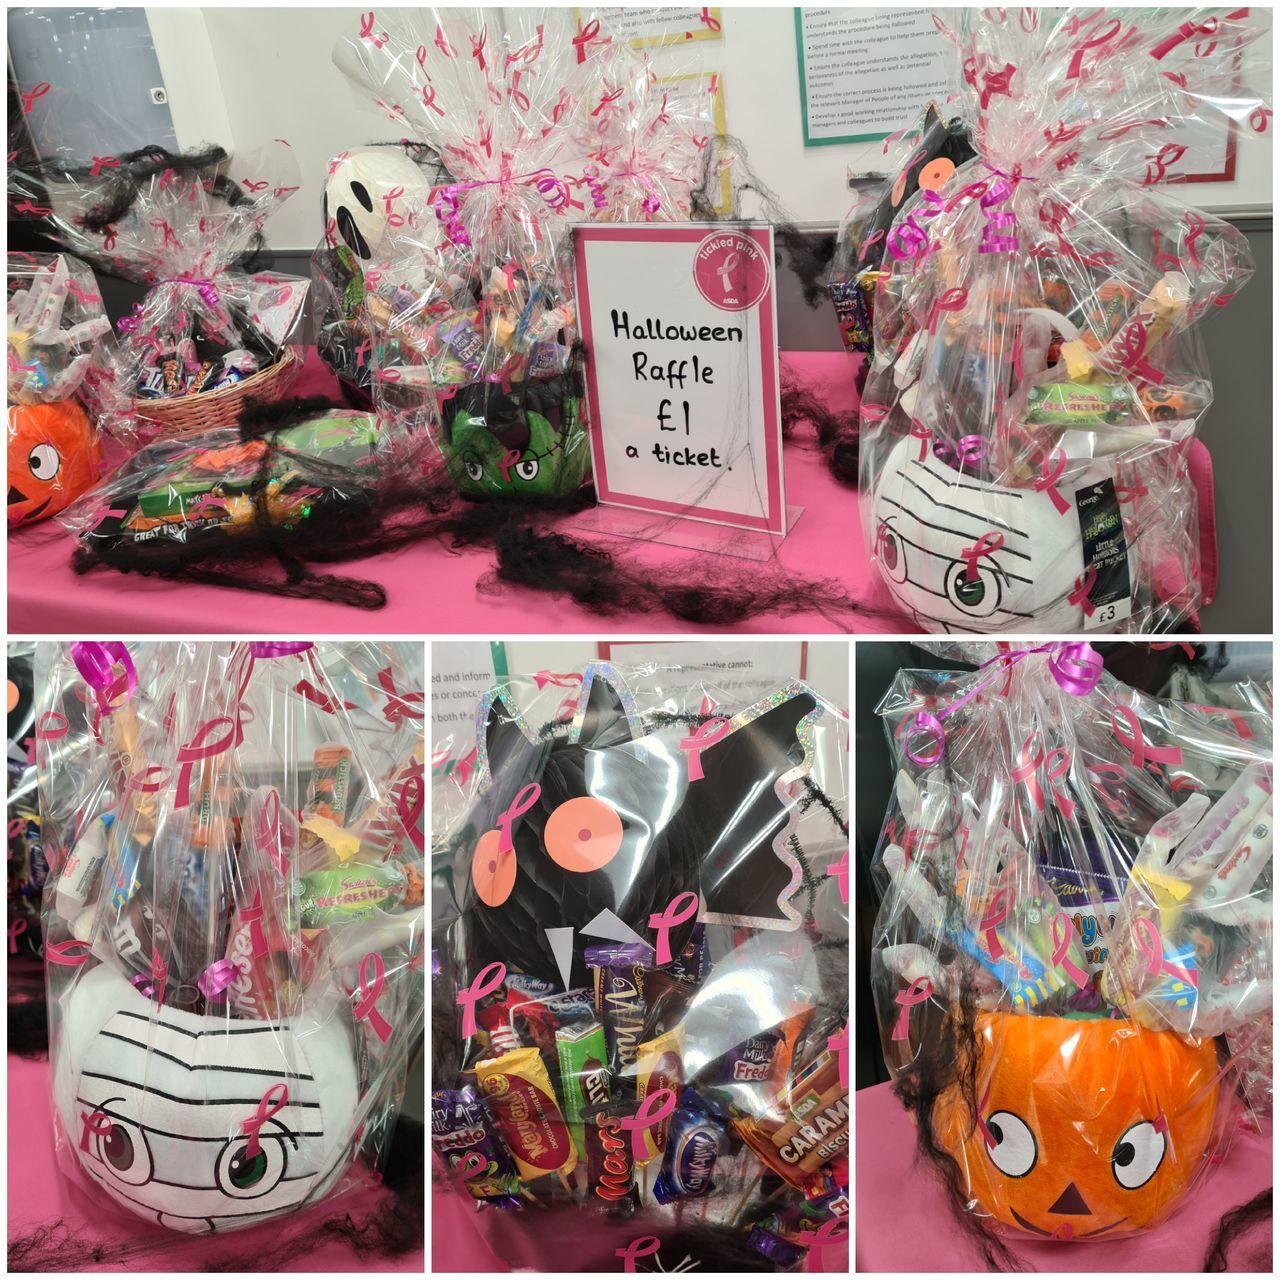 Colleague Halloween raffle | Asda Newport Isle of Wight